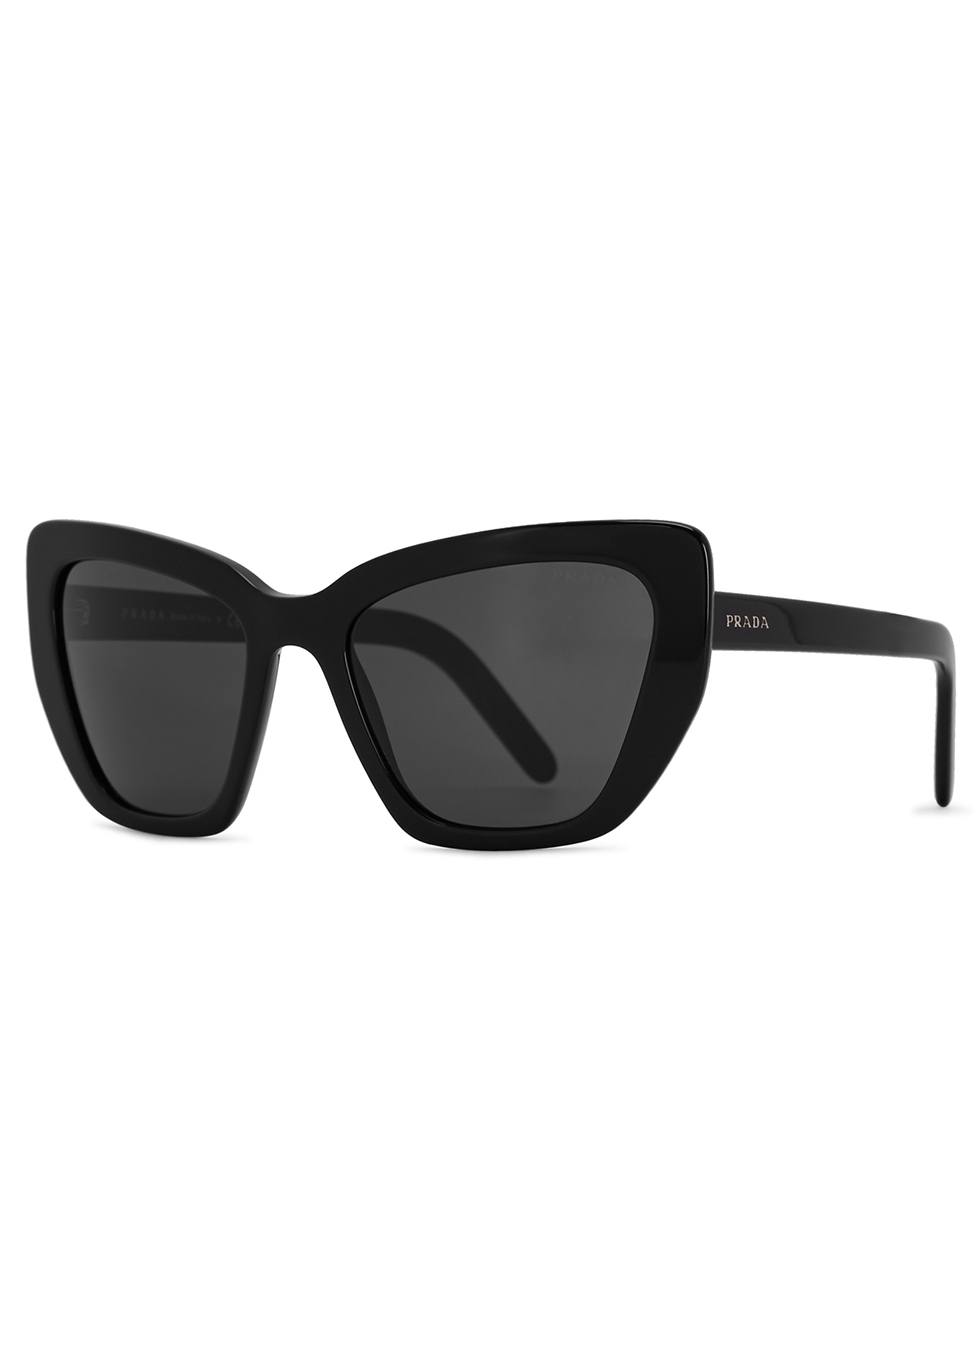 139a45940c9 Women s Designer Sunglasses and Eyewear - Harvey Nichols